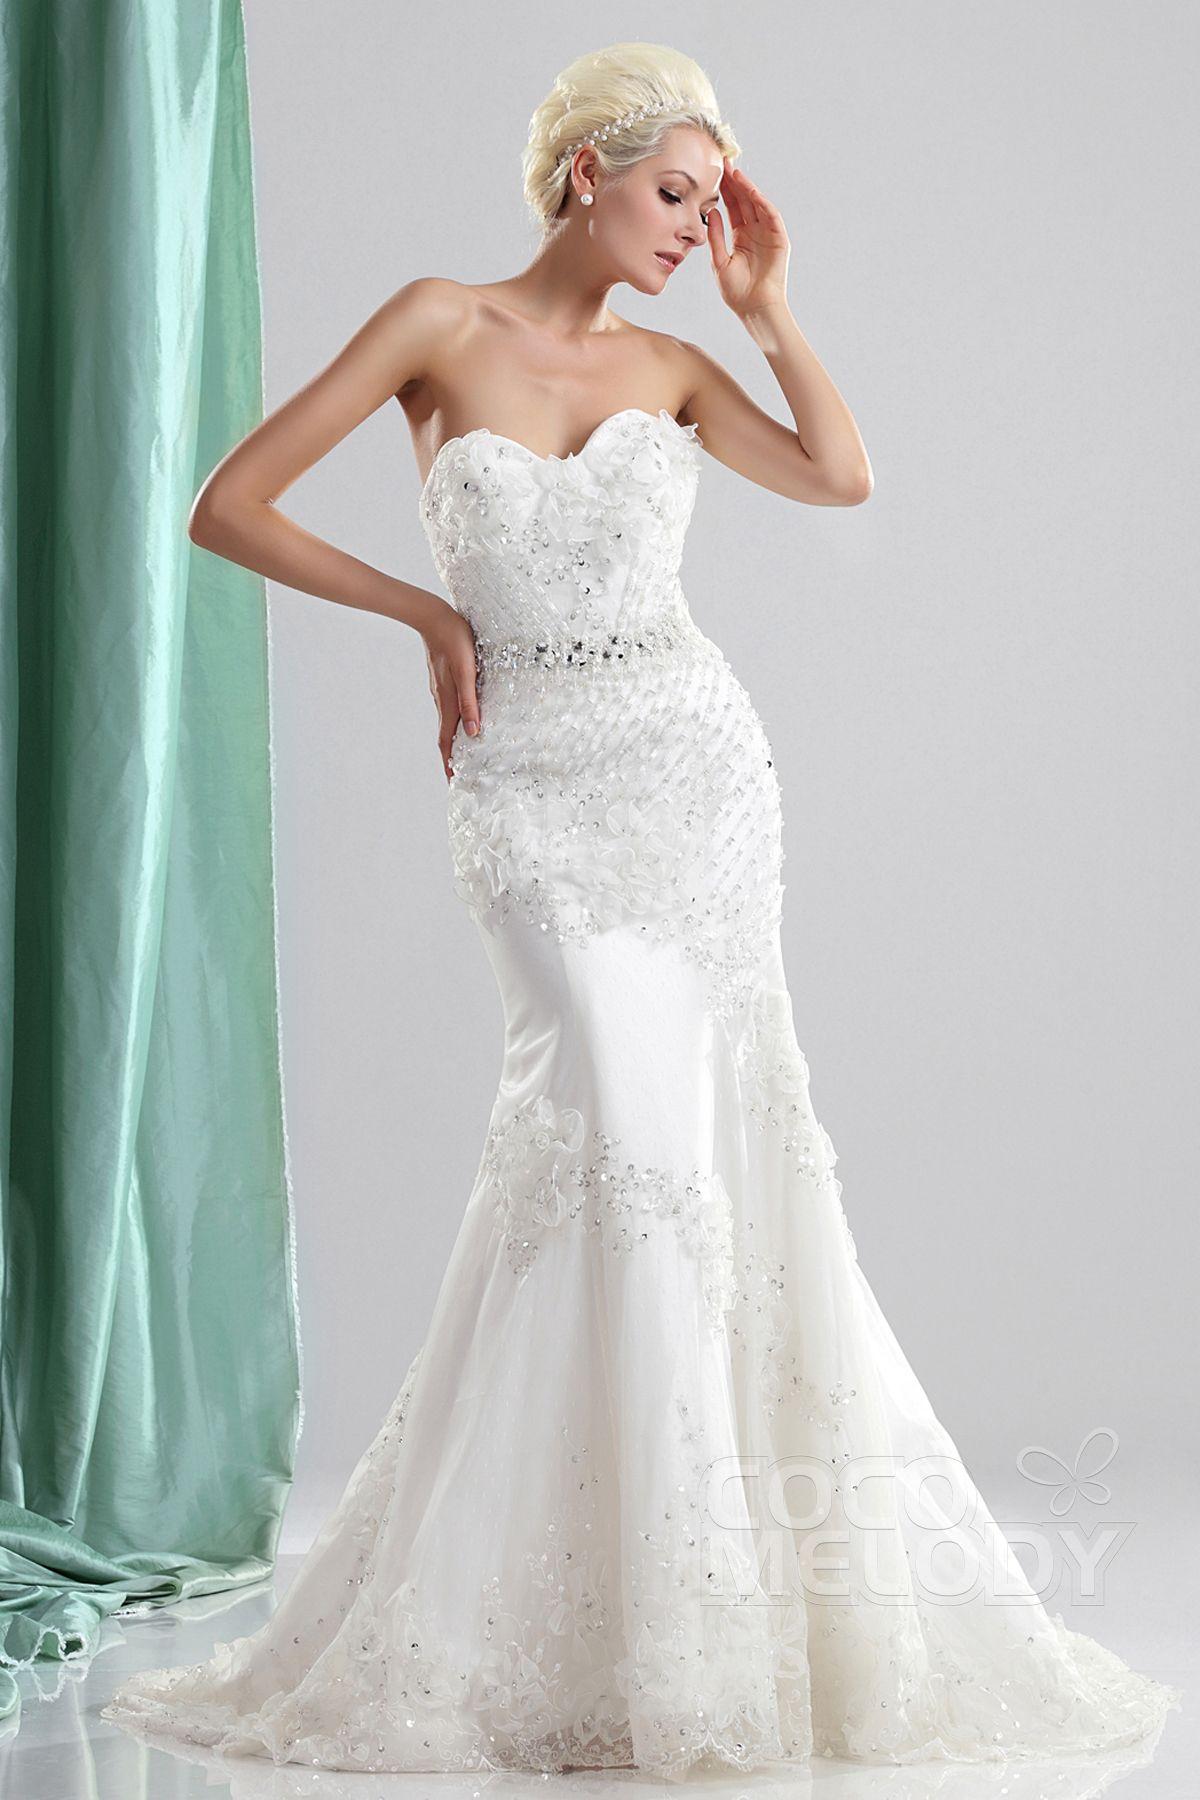 Glamour Trumpet-Mermaid Sweetheart Sweep-Brush Train Organza Wedding Dress CWLT130E5